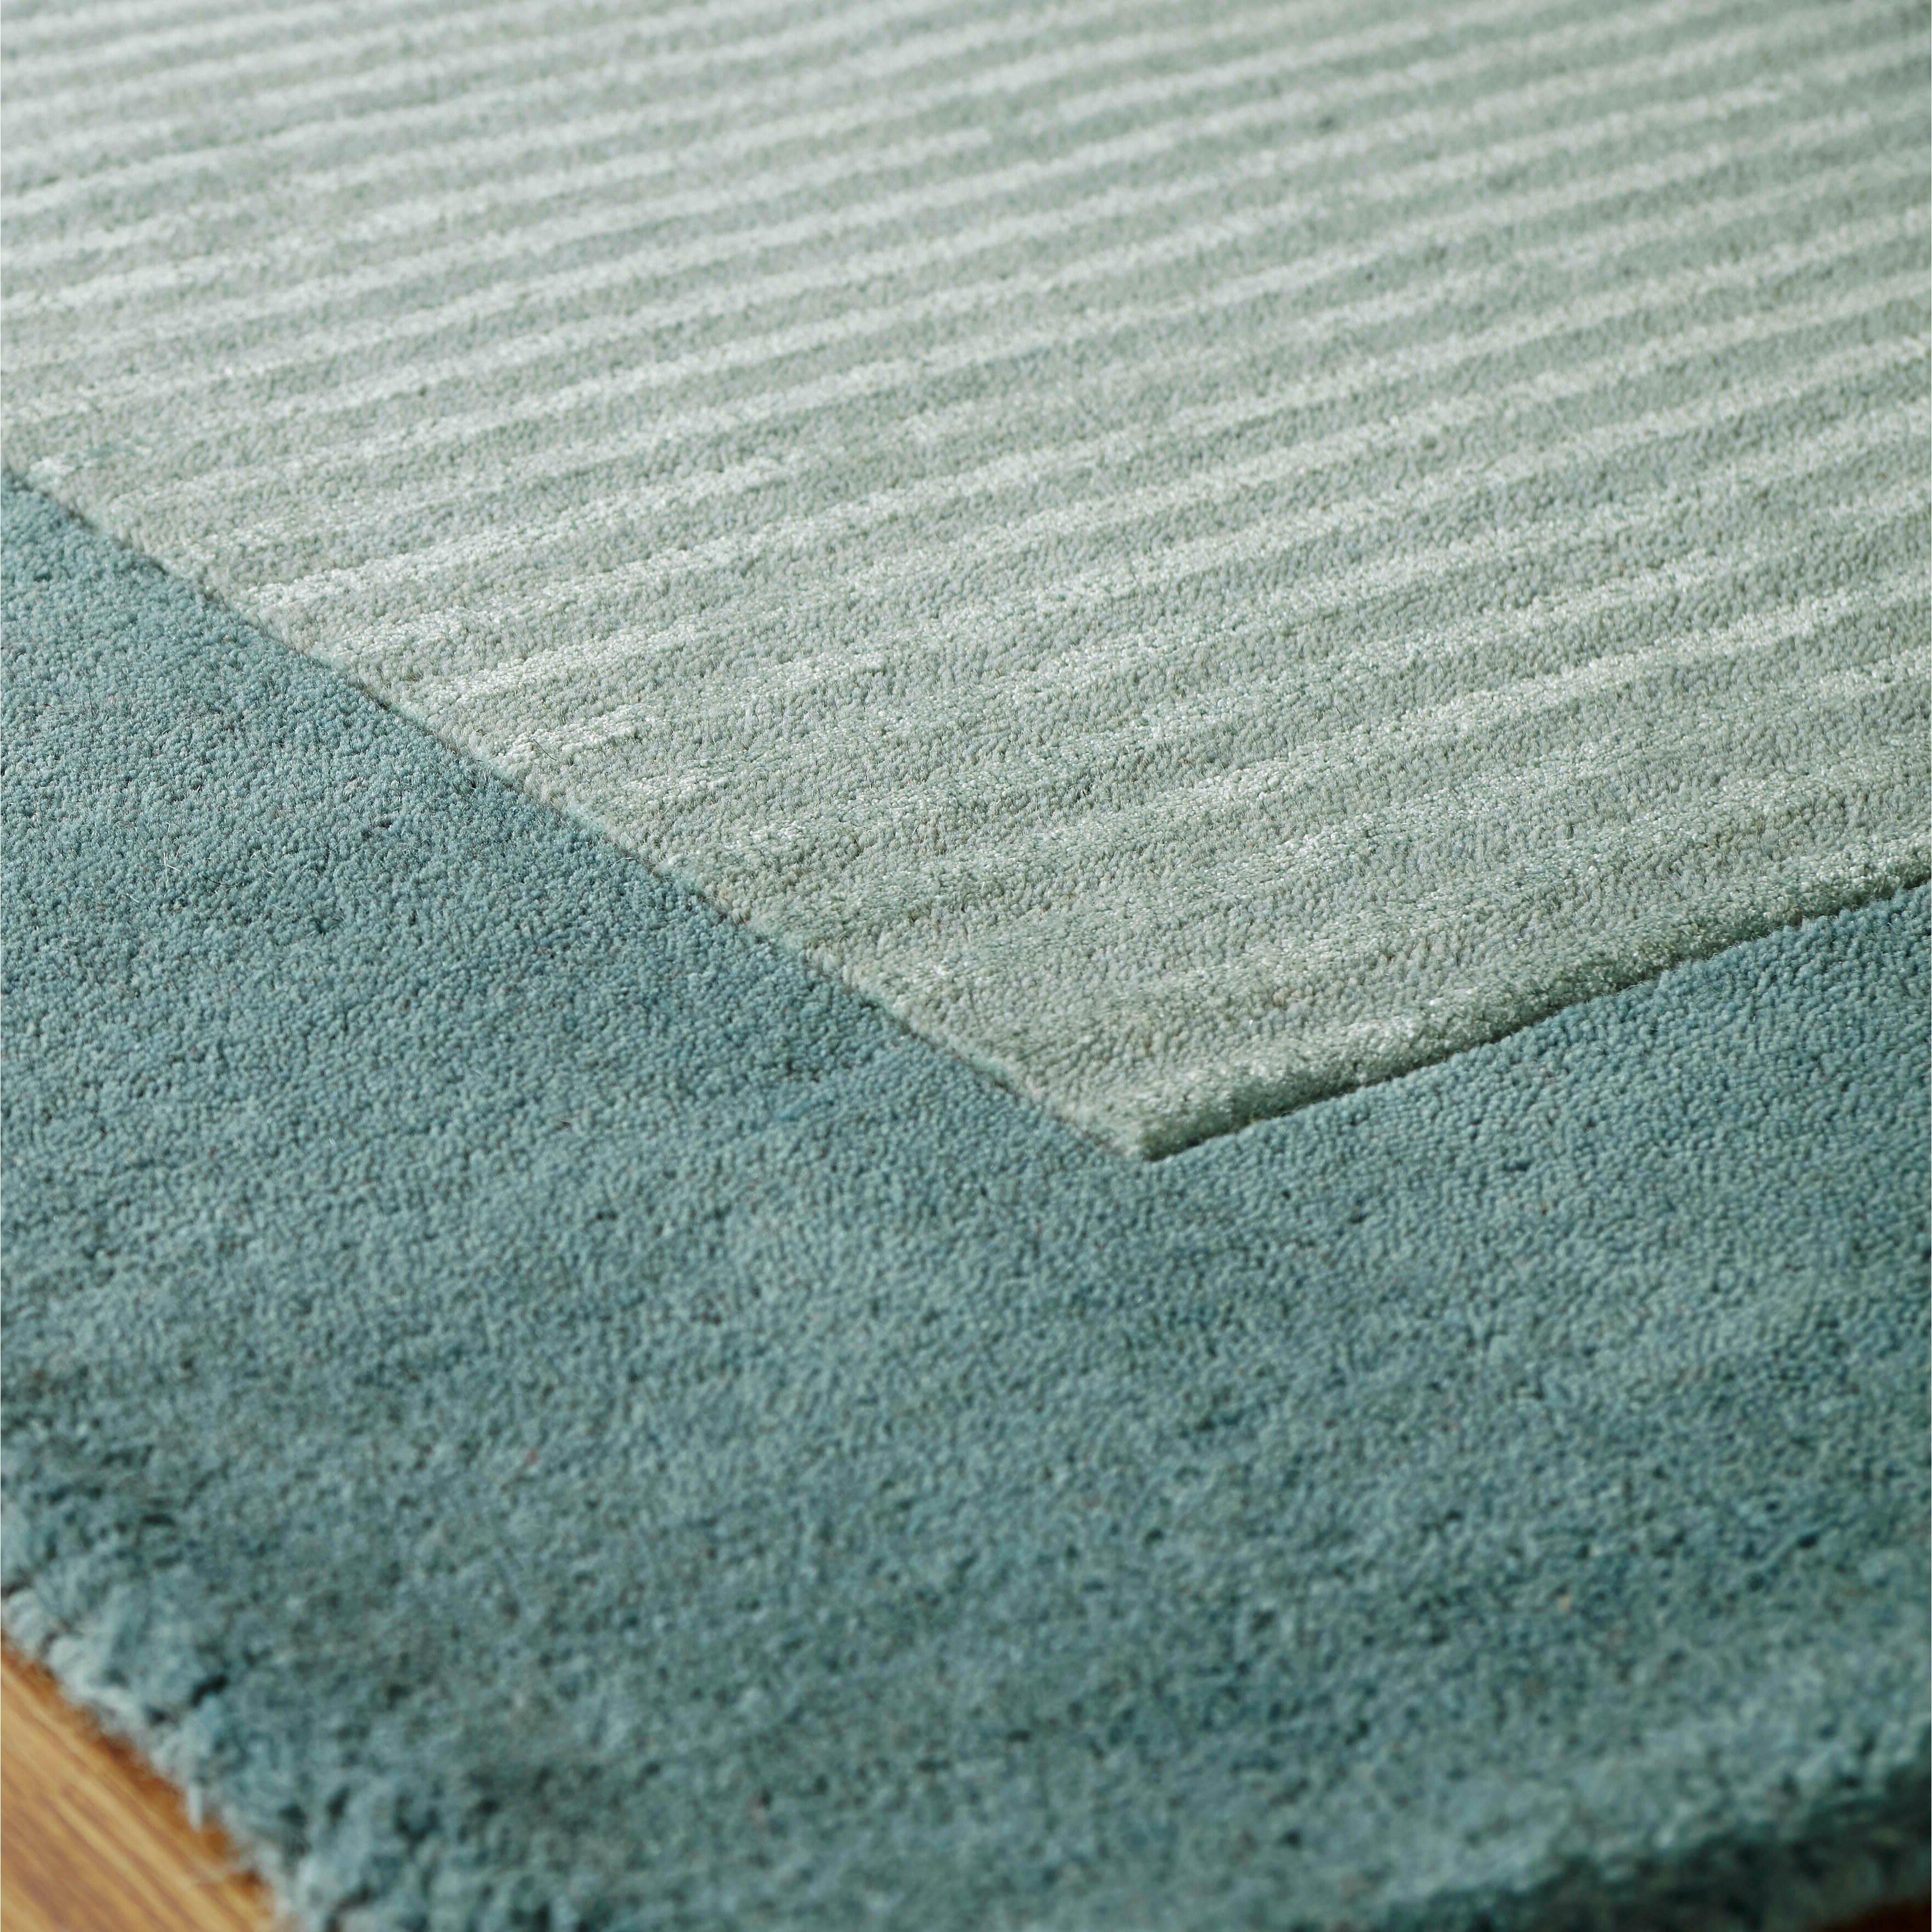 brook lane rugs henley hand woven duck egg blue area rug. Black Bedroom Furniture Sets. Home Design Ideas